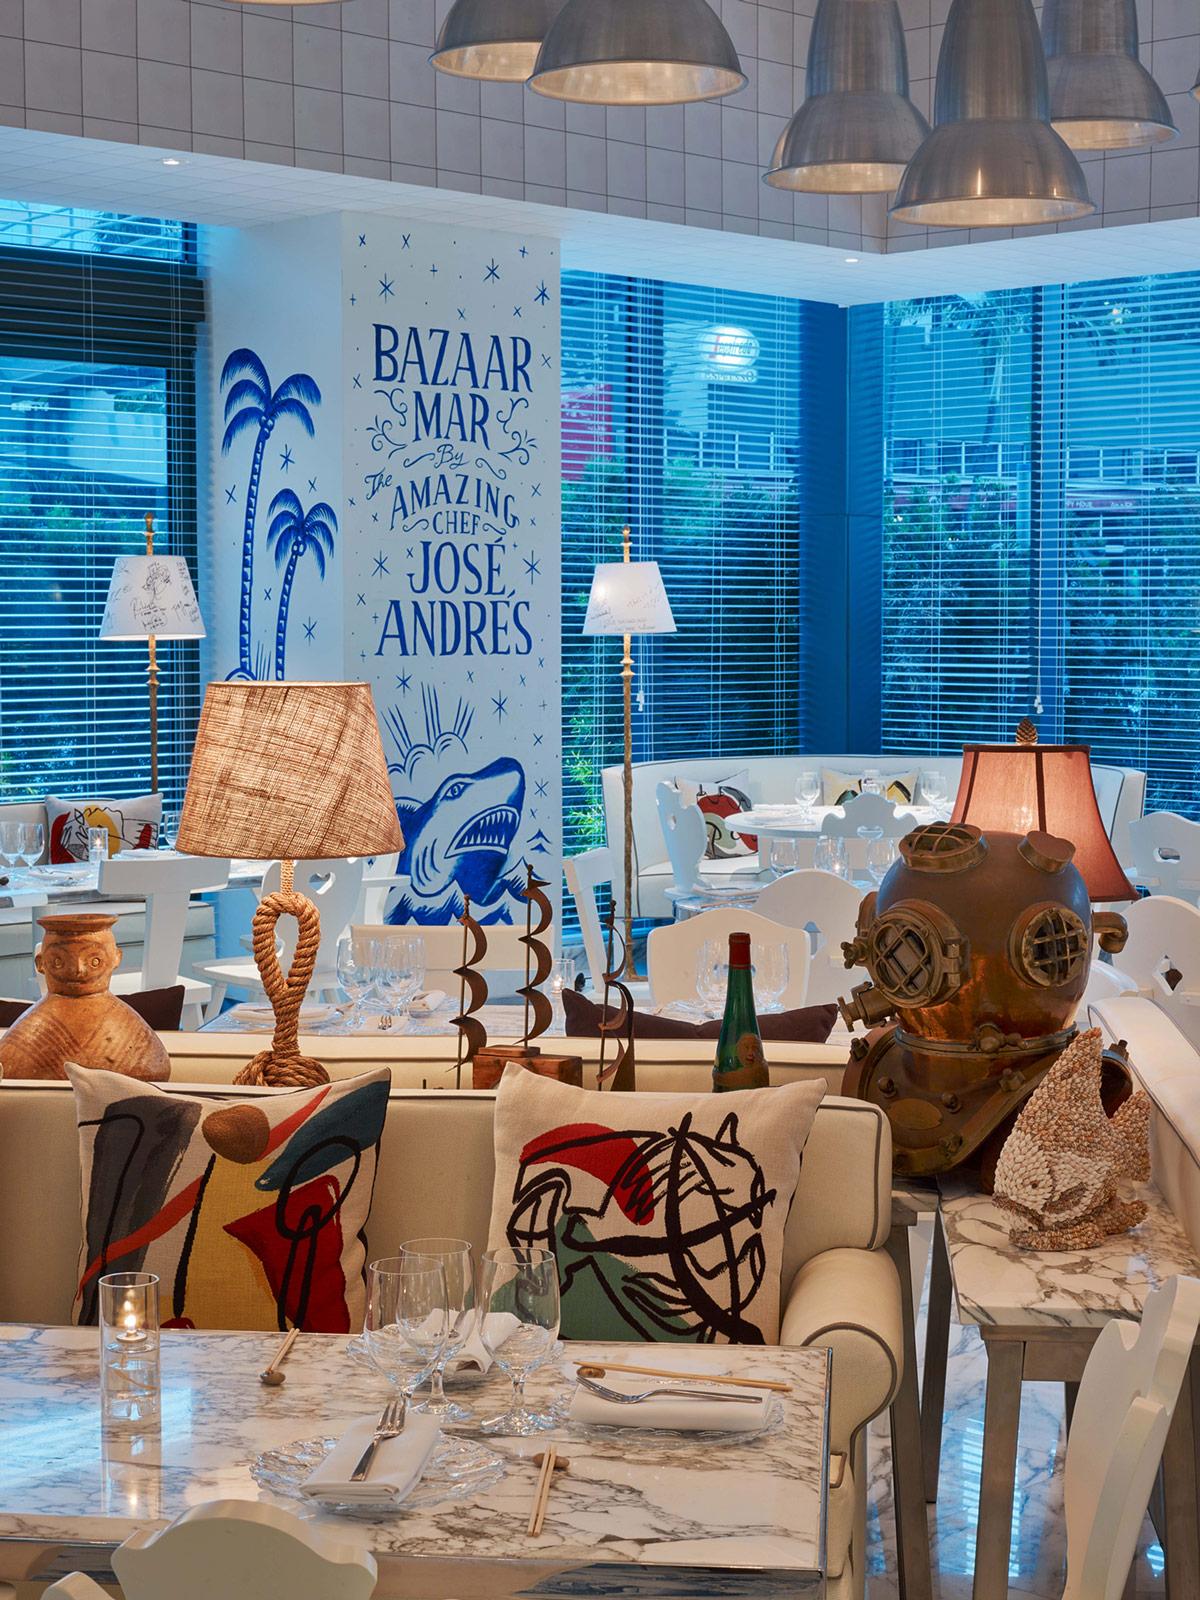 Bazaar_Mar_Miami_3.jpg